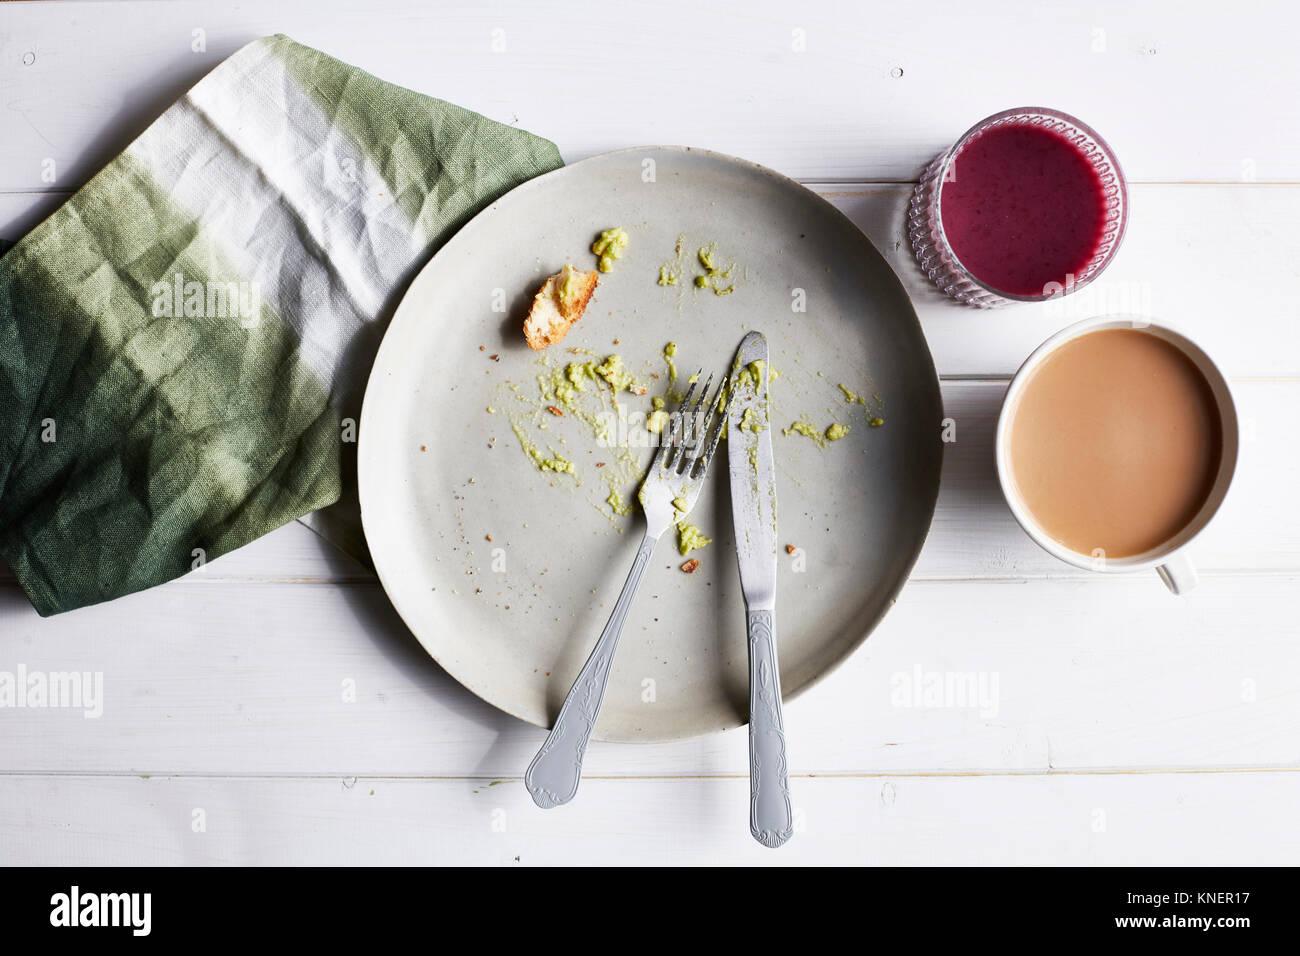 Eaten avocado meal, overhead view - Stock Image